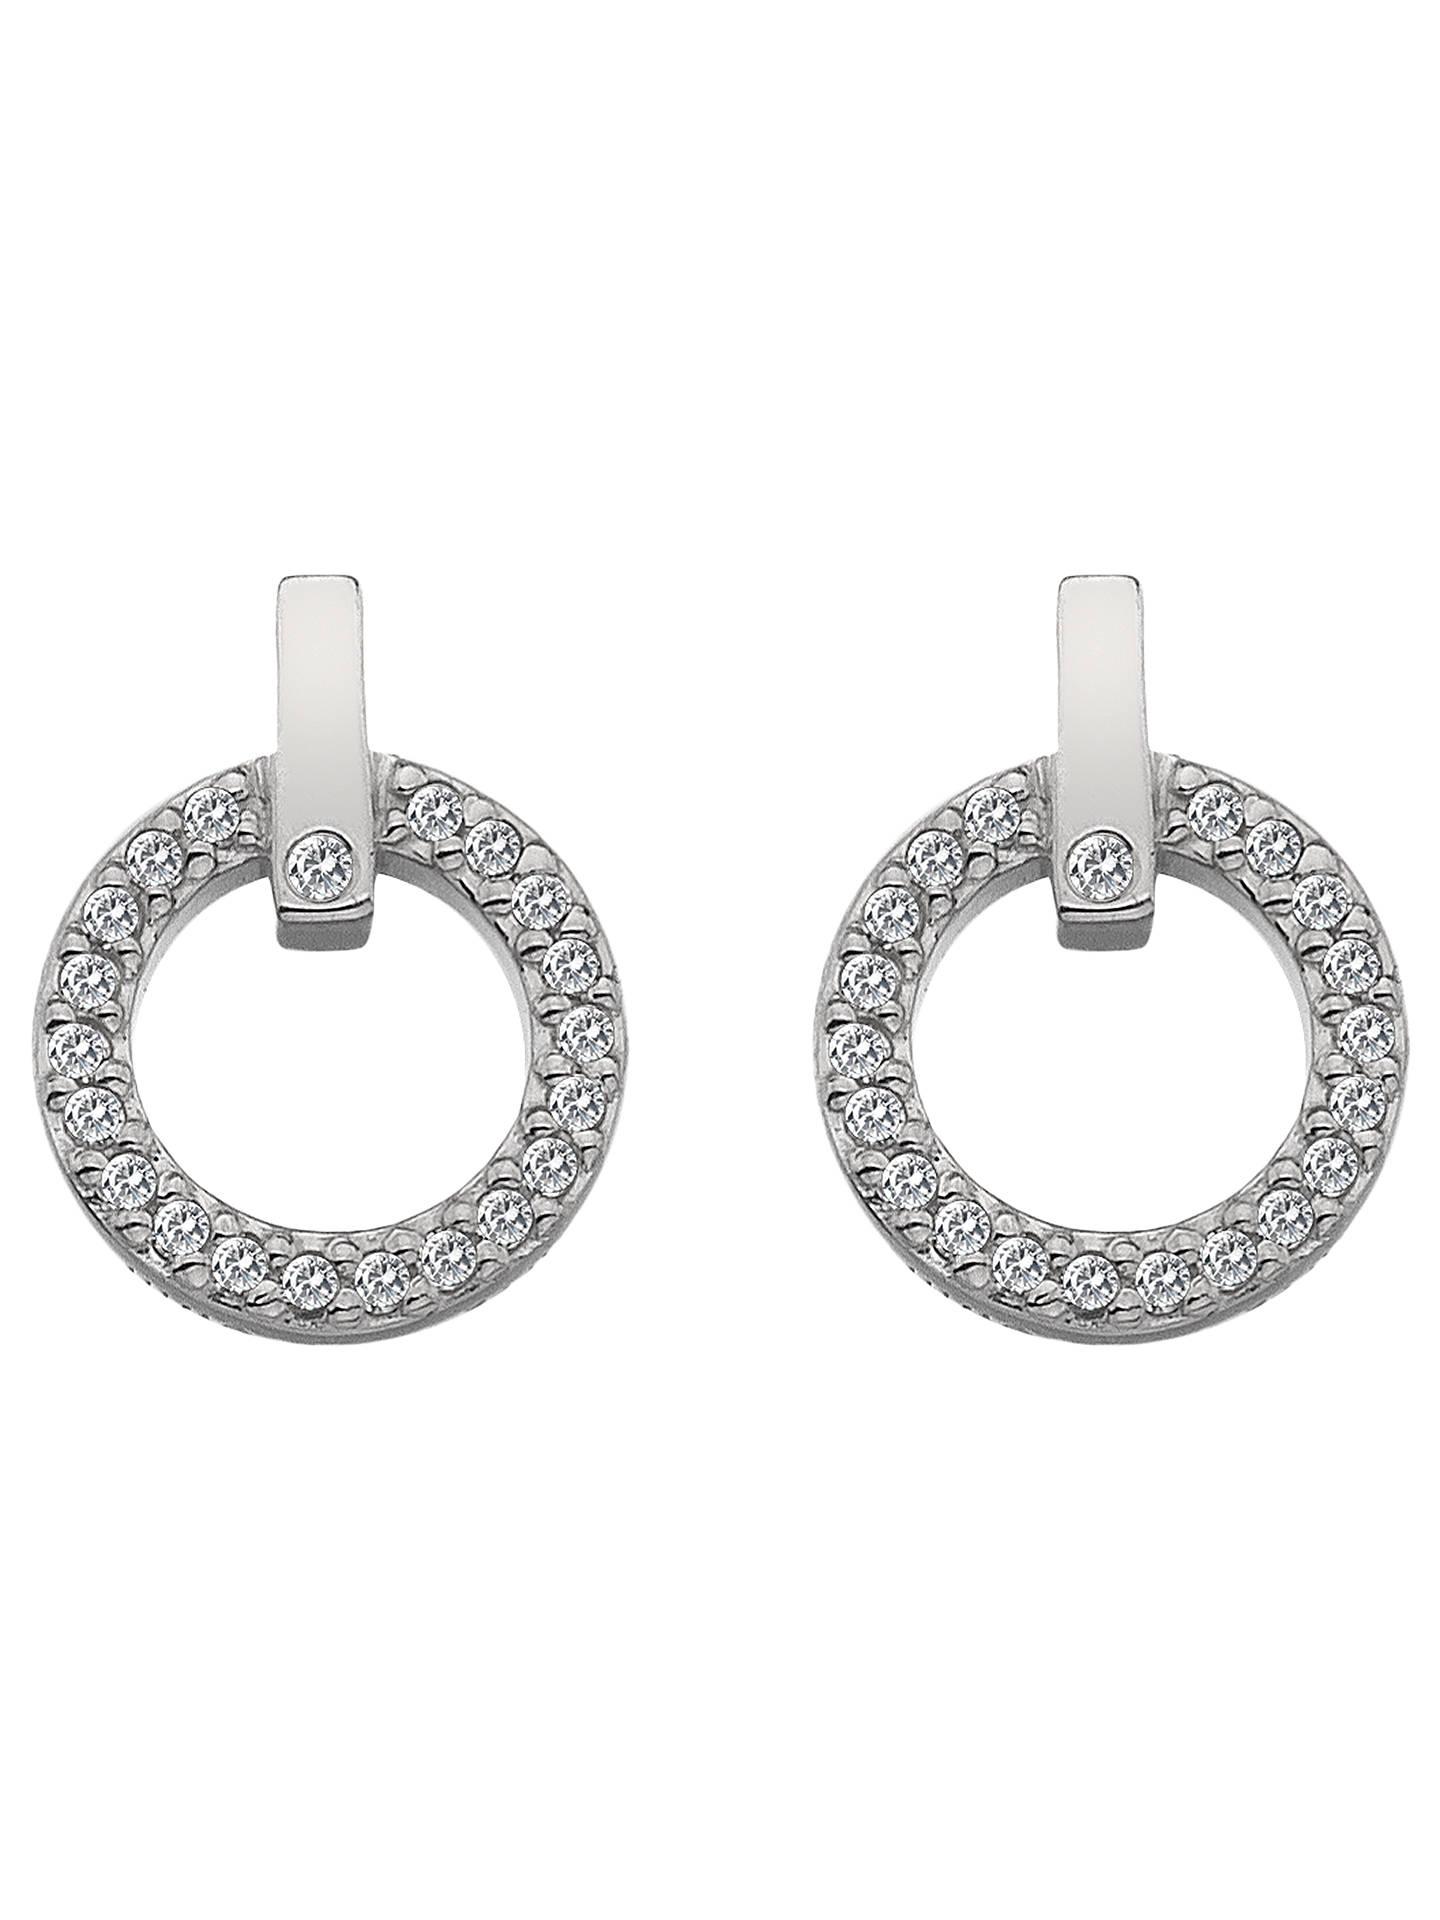 8a30600531956 Hot Diamonds White Topaz and Diamond Circle Stud Earrings, Silver